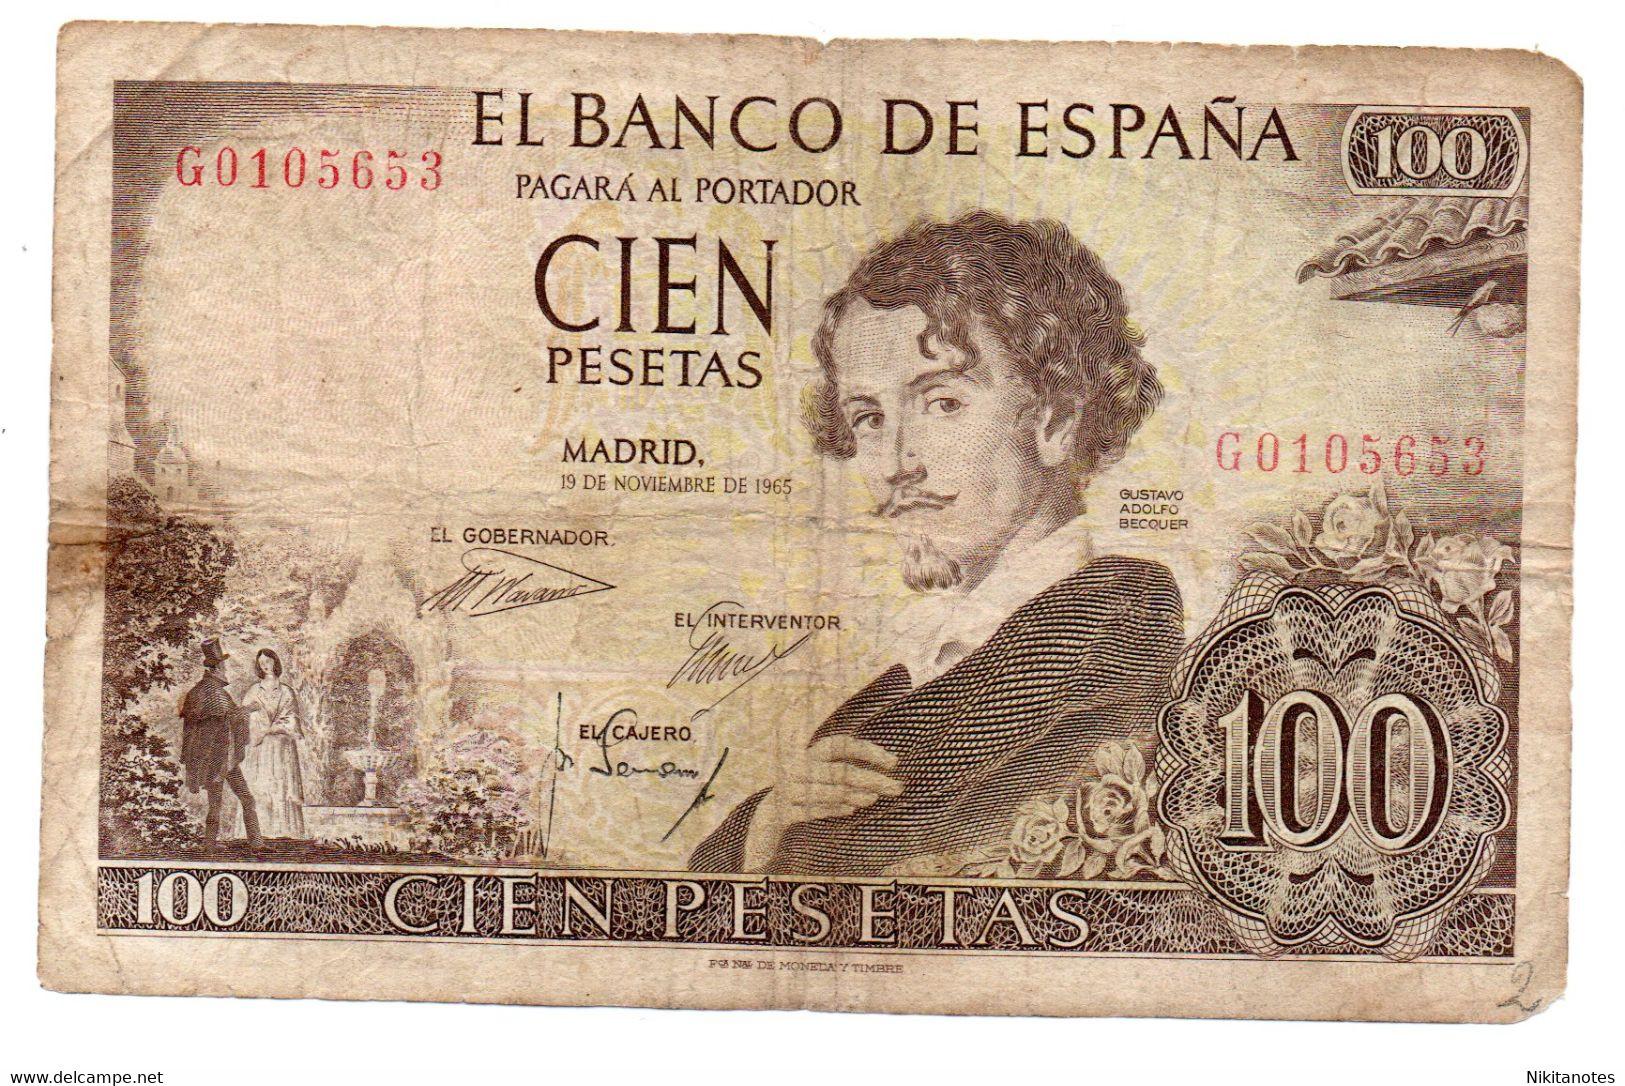 SPAIN 100 PESETAS 1965 P.150 GUSTAVO ADOLFO BECQUER - [ 3] 1936-1975 : Regency Of Franco